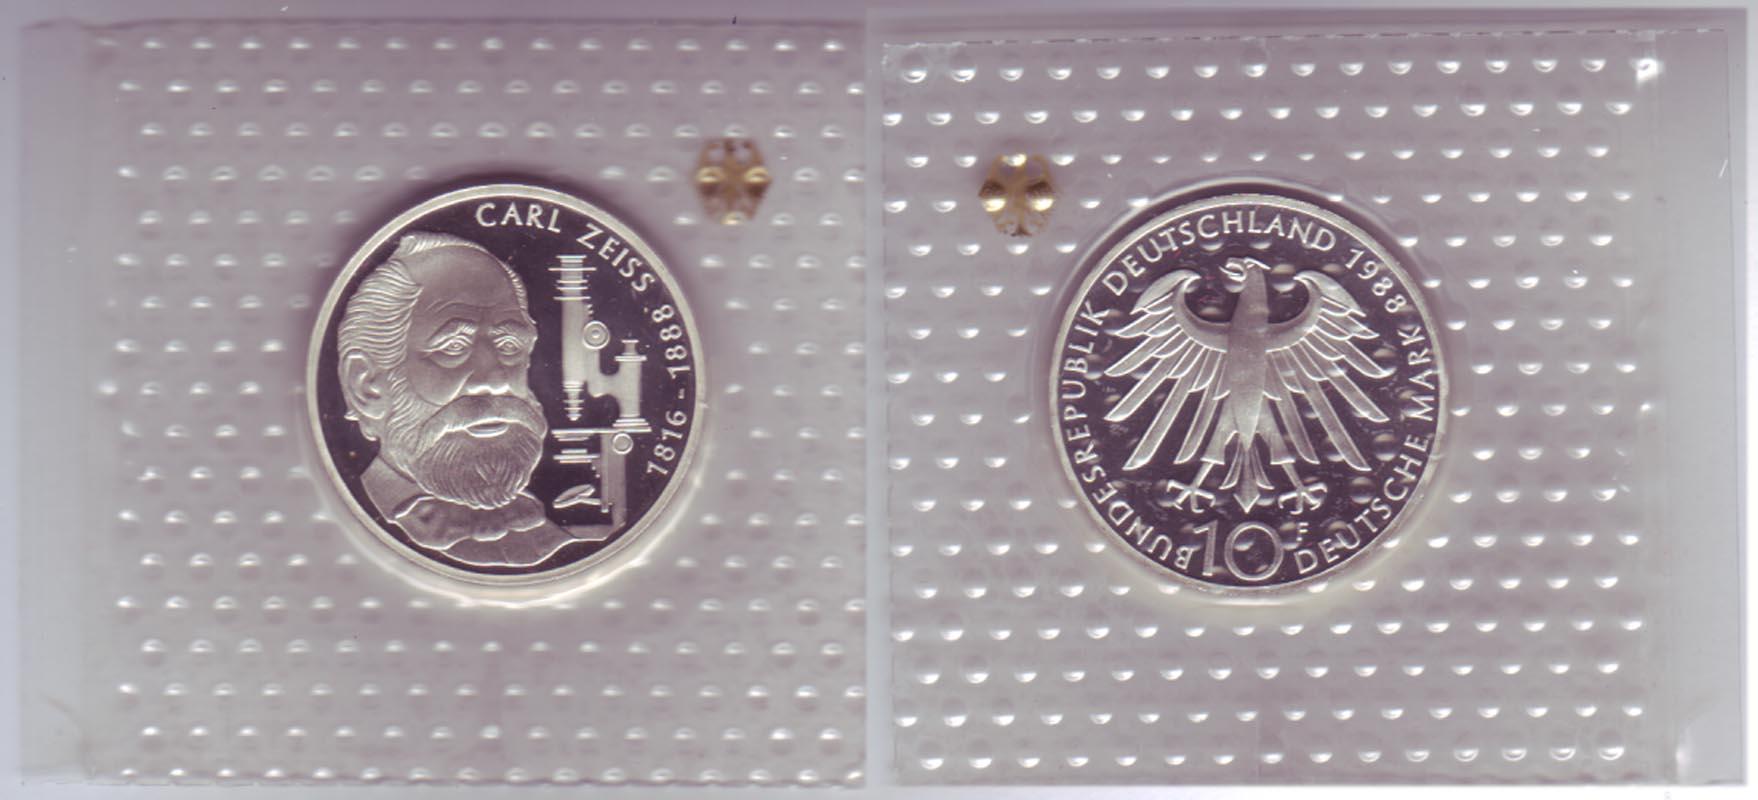 Silbermünze 10 Dm 1988 Carl Zeiss Polierte Platte F 4